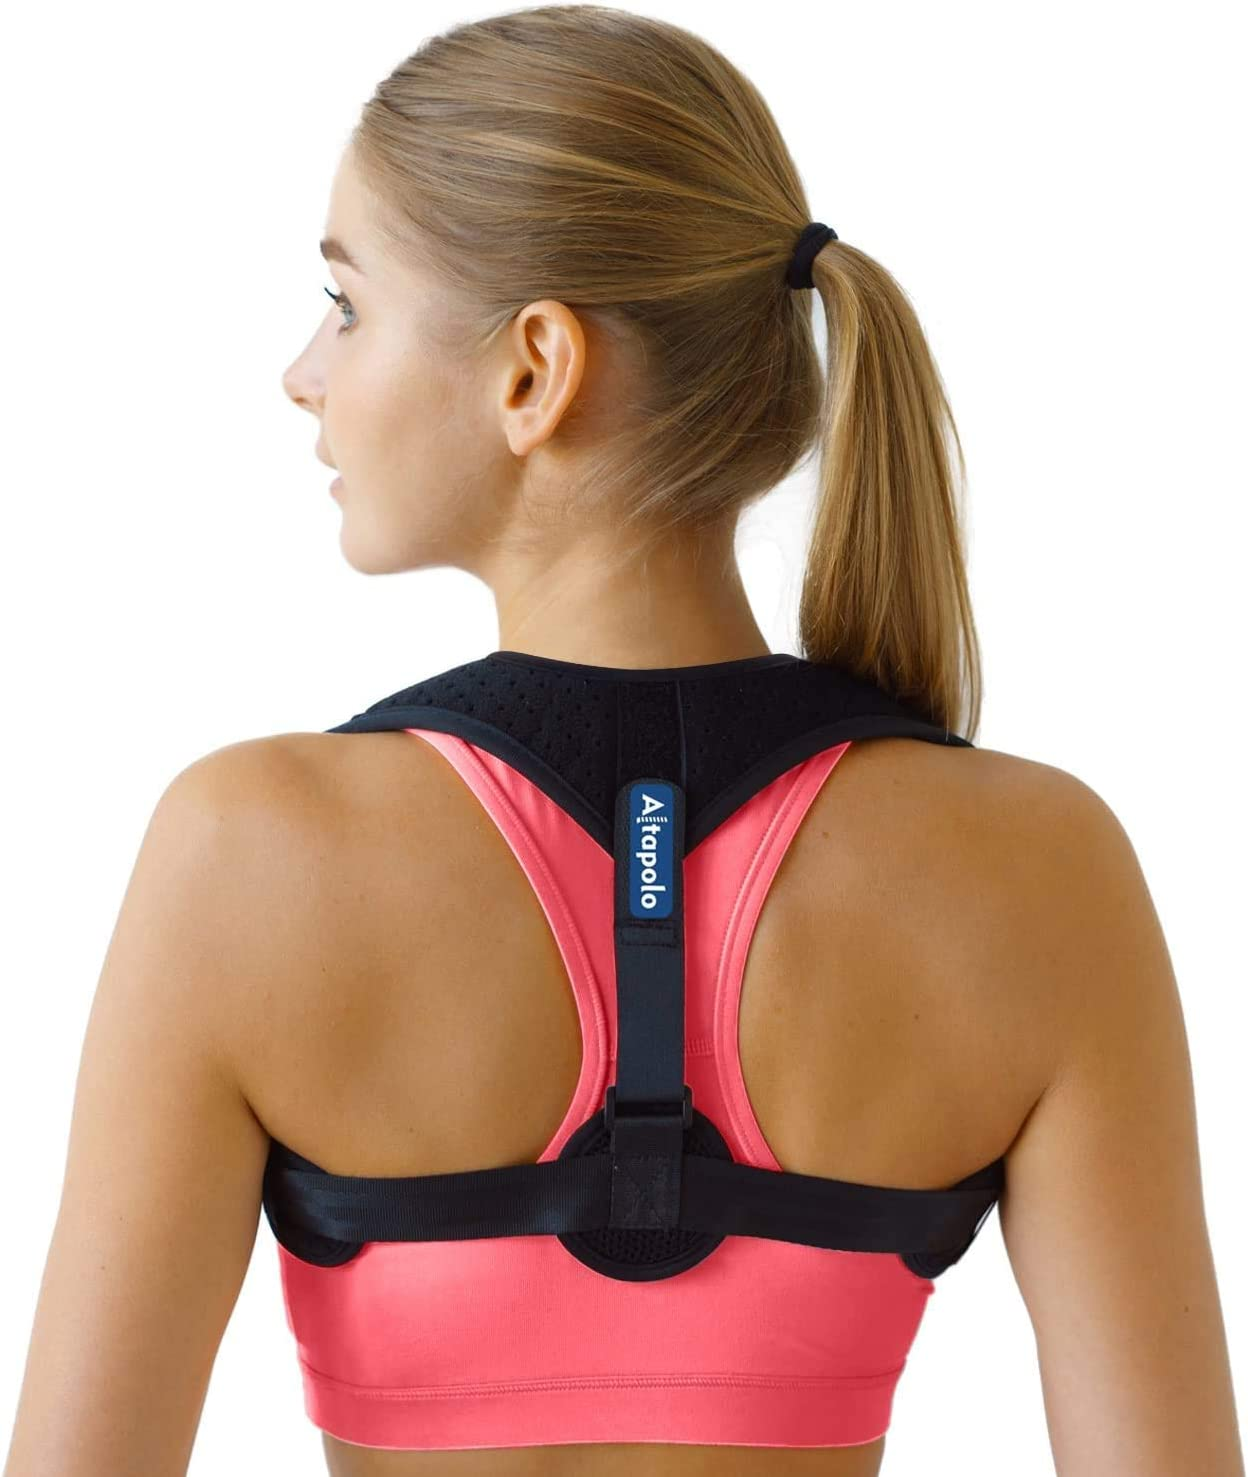 Posture Corrector for Men & Women - Adjustable Shoulder Posture Brace - Figure 8 Clavicle Brace for Posture Correction and Alignment